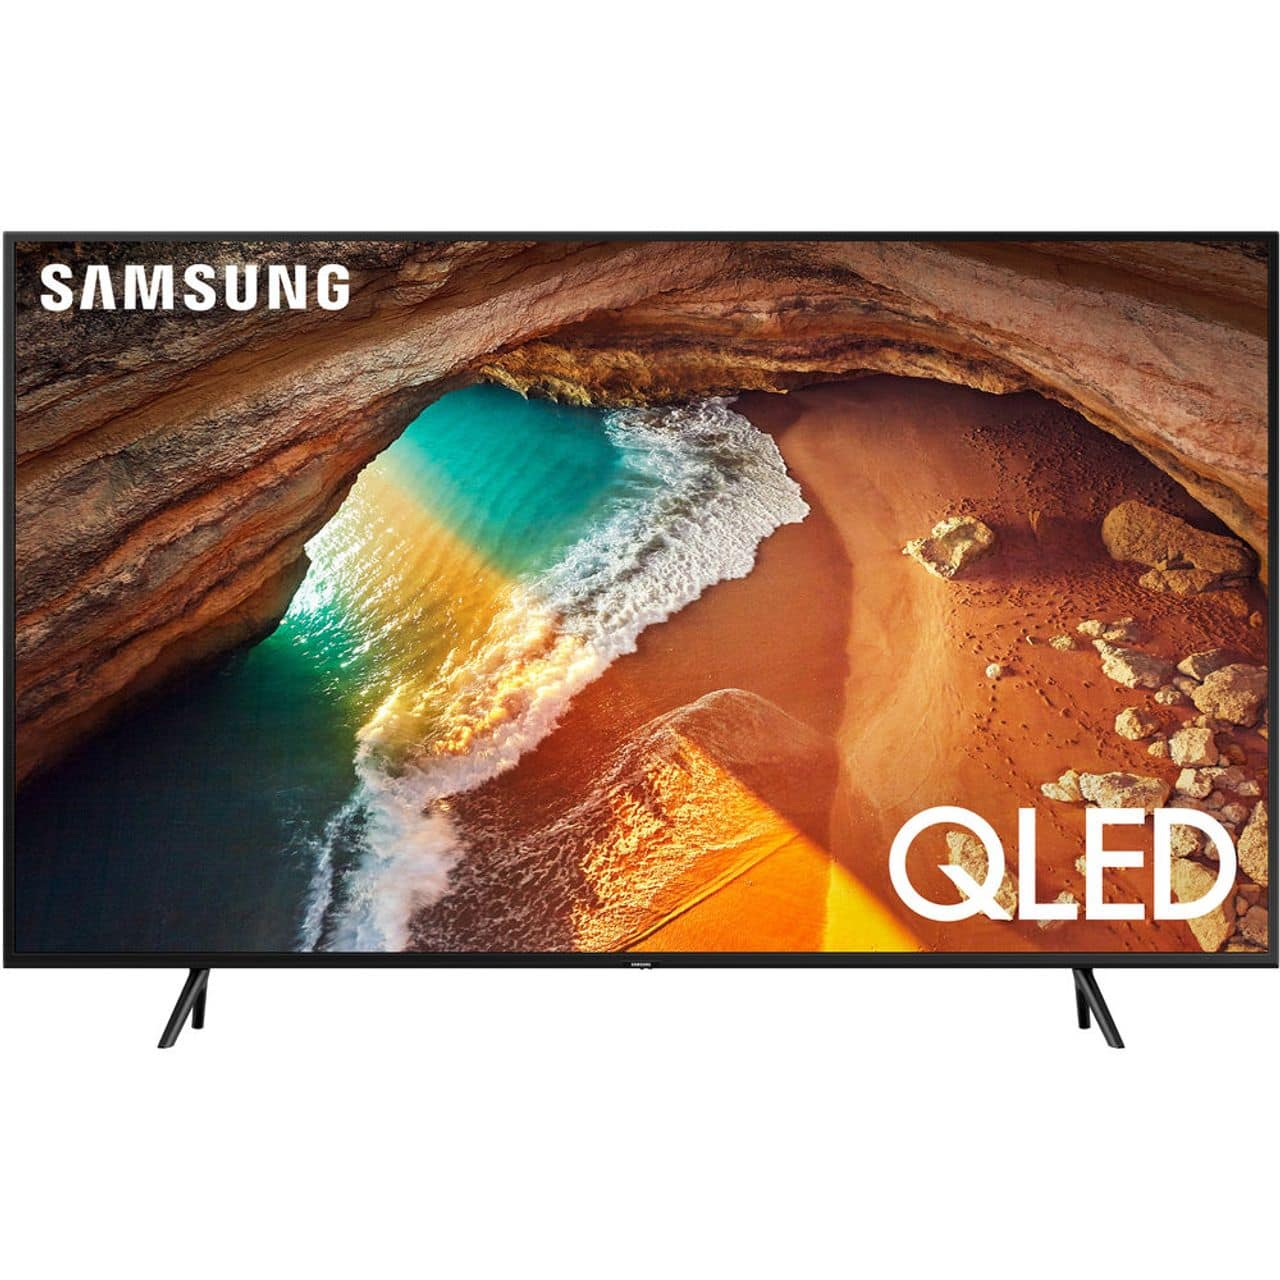 "Samsung 82"" Q60R Series QLED 4K UHD Smart TV QN82Q60RAFXZA – $1799 + Free Shipping"